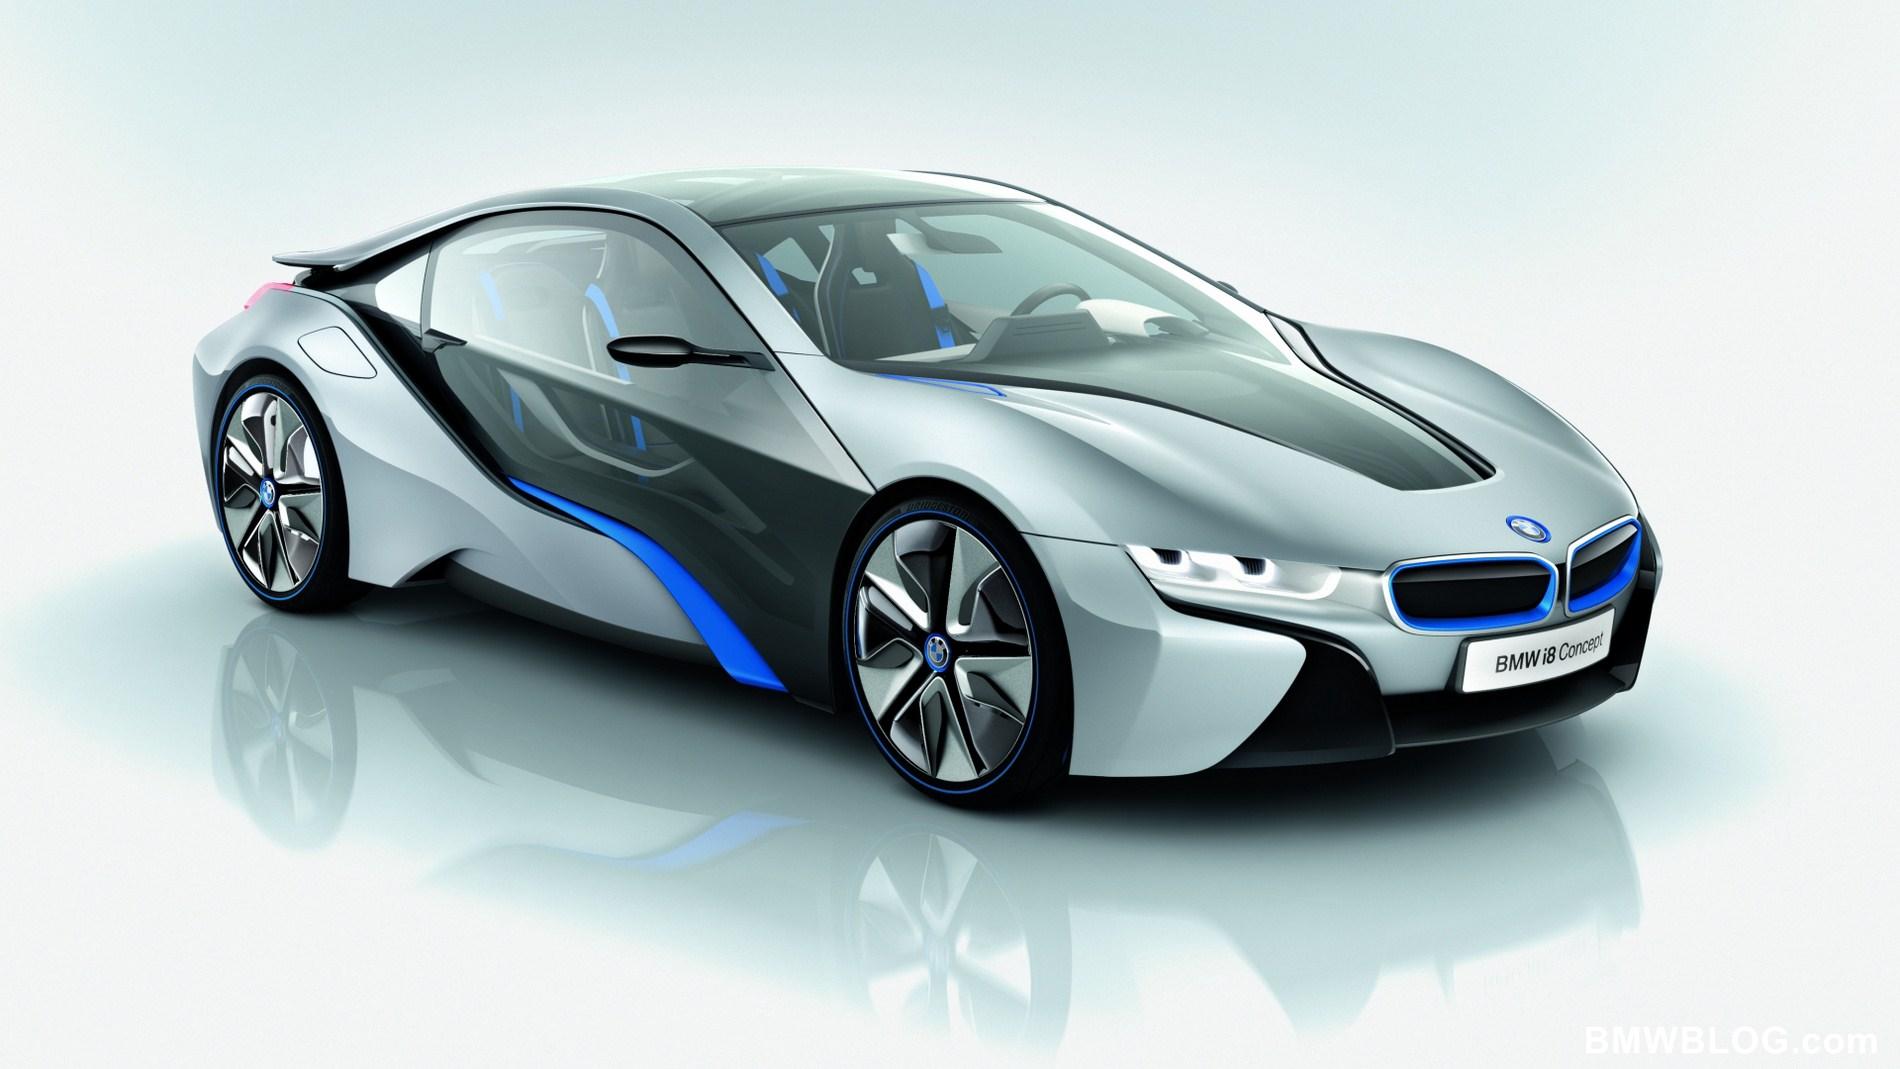 Bmw I8 Concept Emotional Dynamic And Efficient 2012 bmw i8 i3 concept cars 6